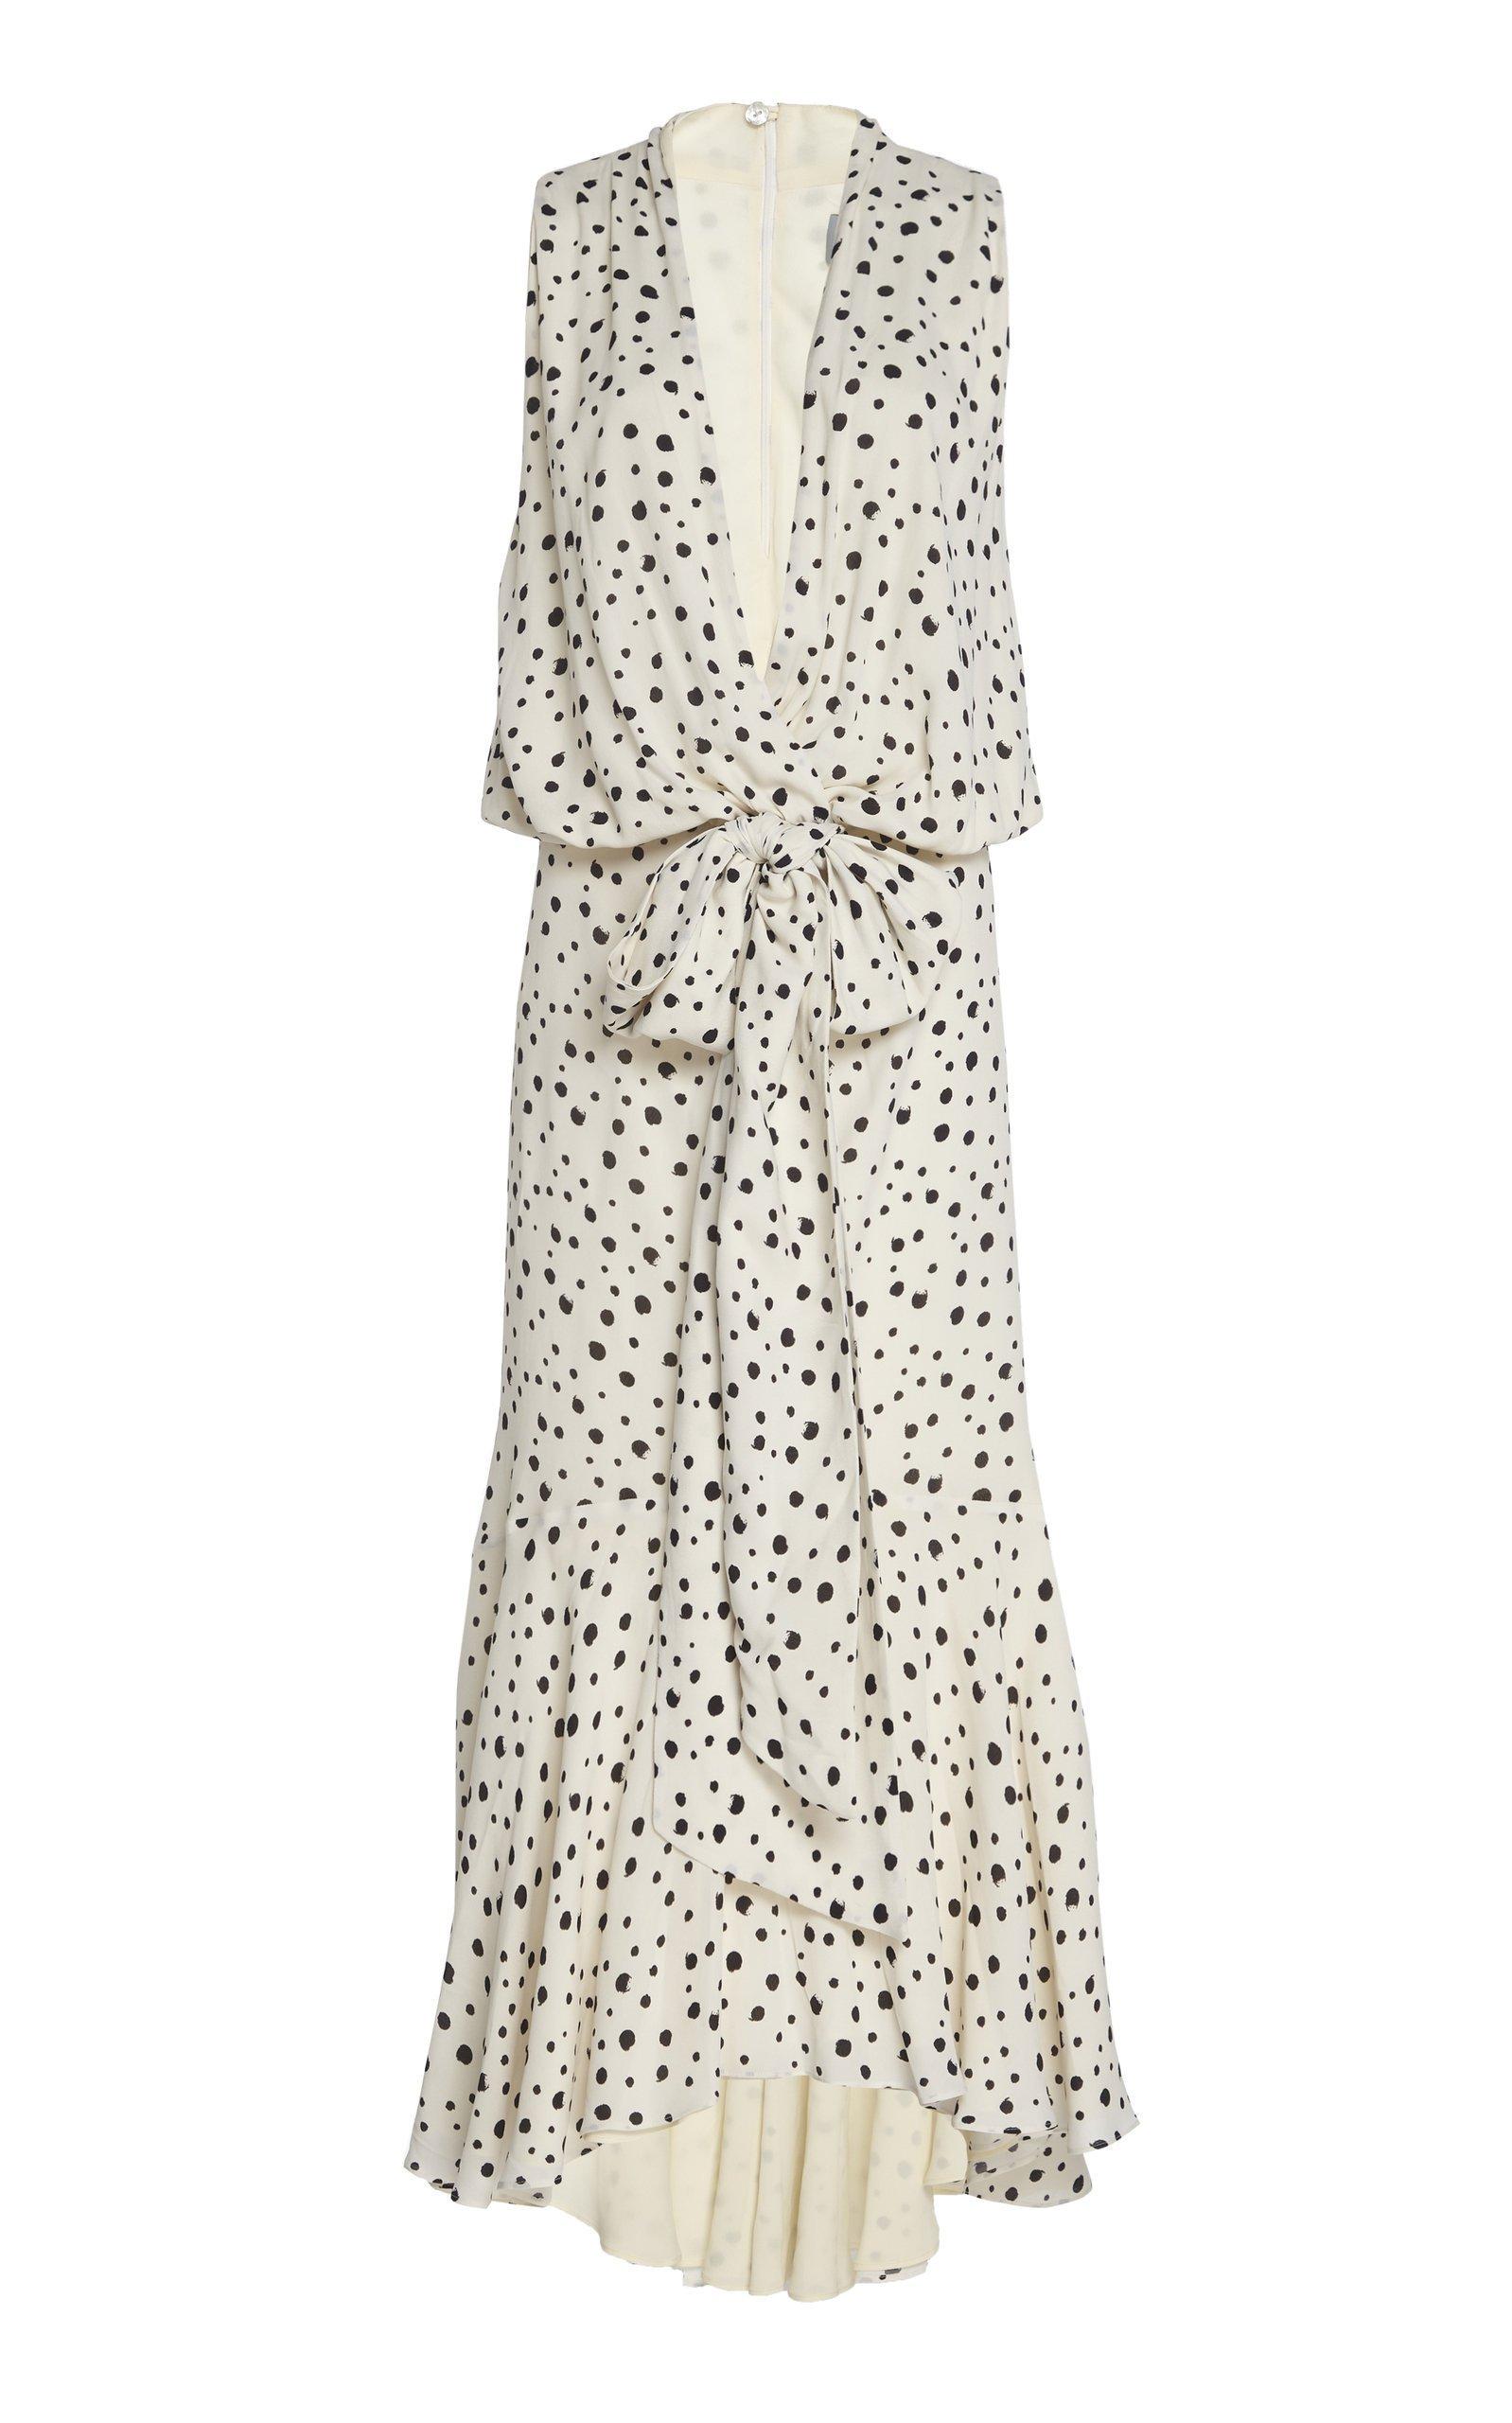 Silvia Tcherassi Nini Crepe De Chine Dress Size: S